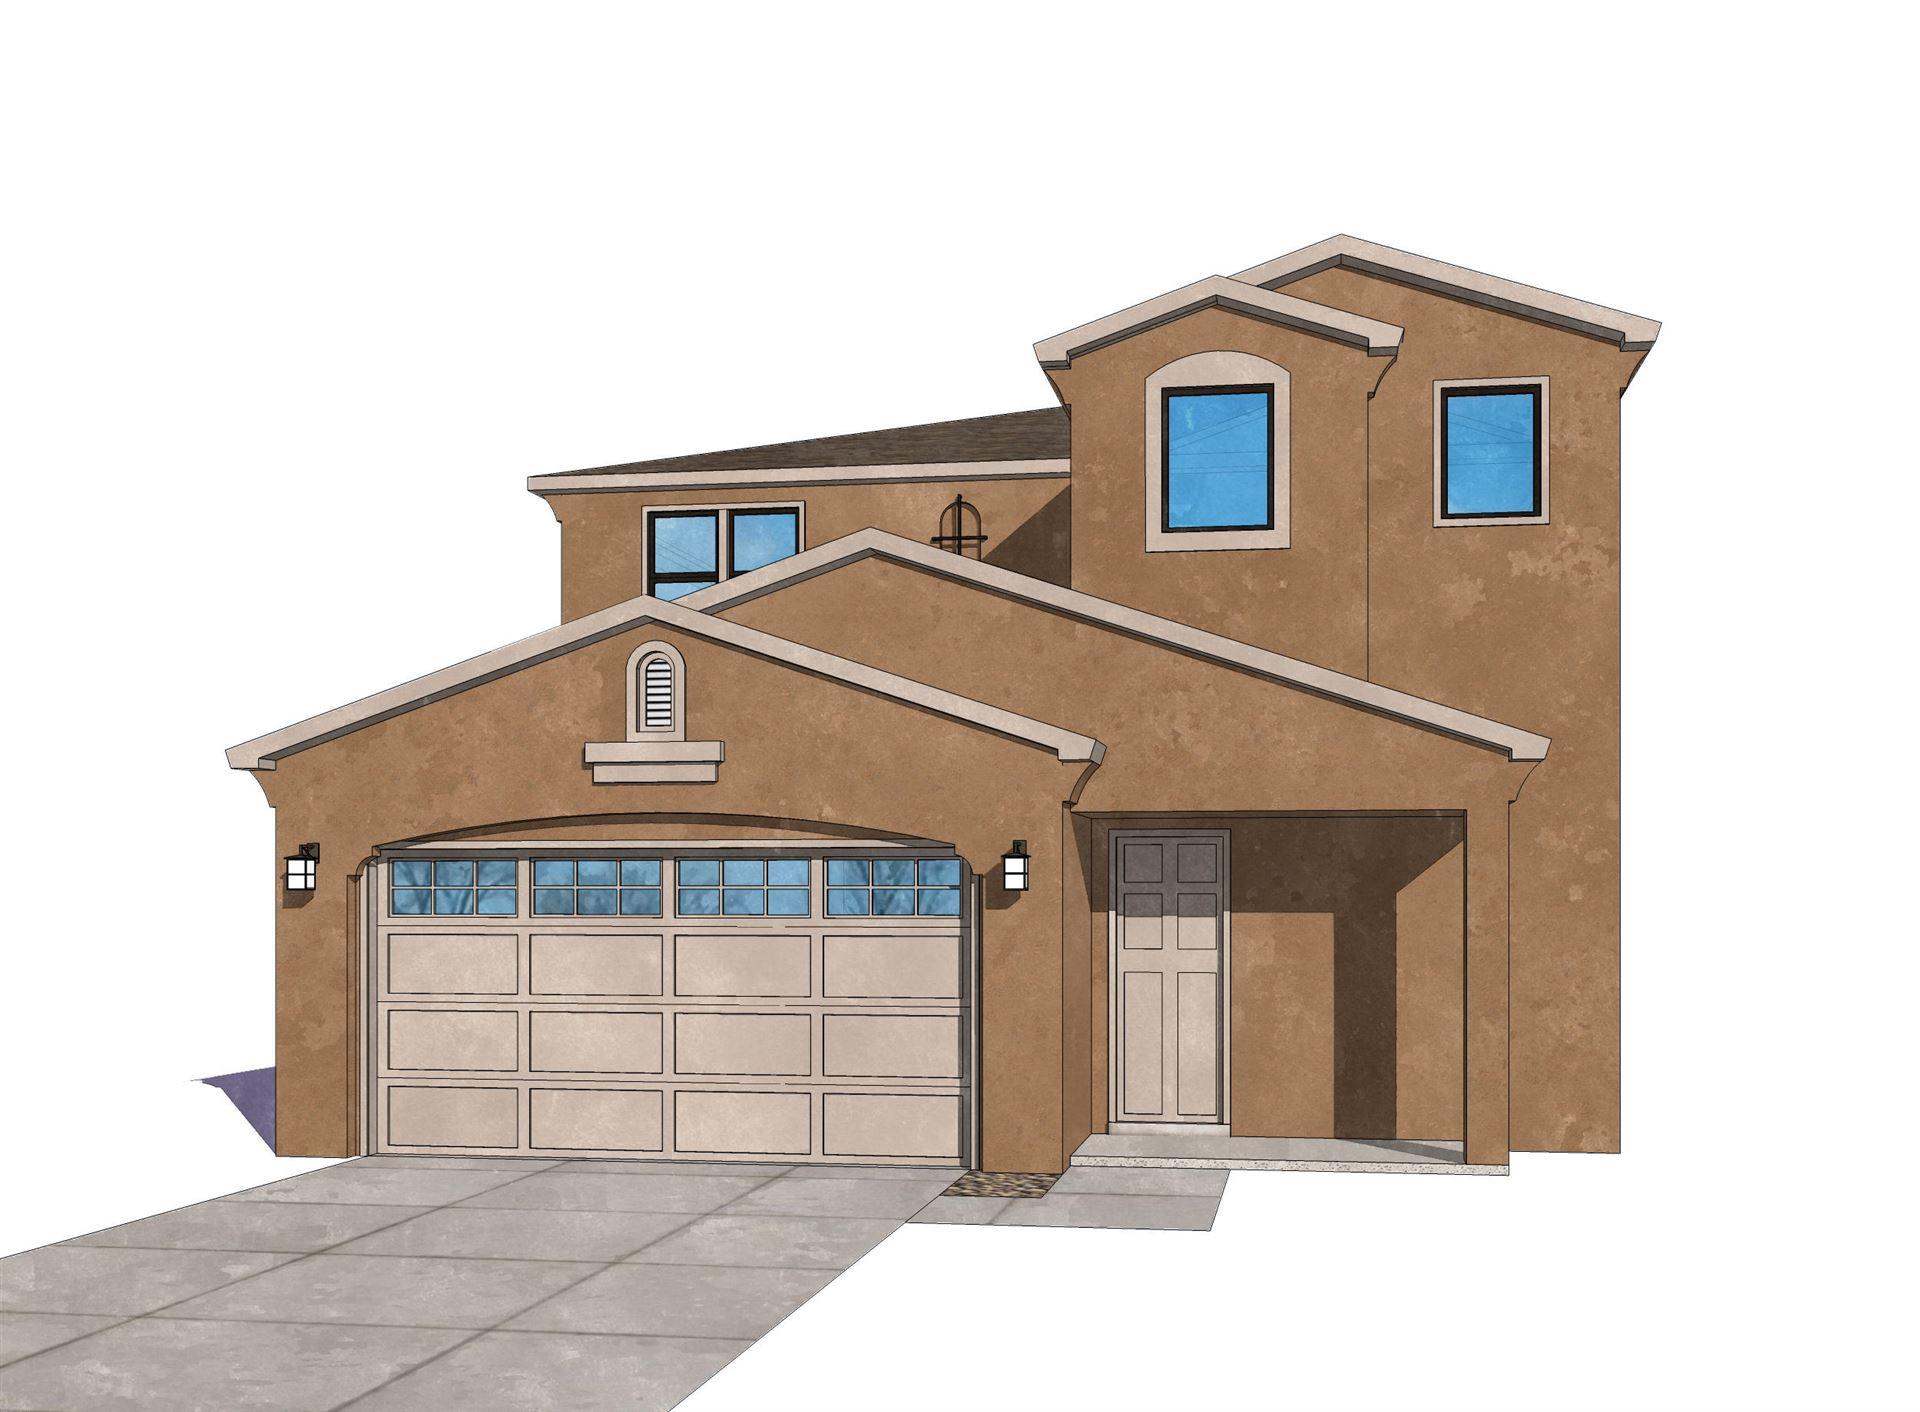 2019 WHITE DOVE Street SE, Albuquerque, NM 87123 - MLS#: 983671